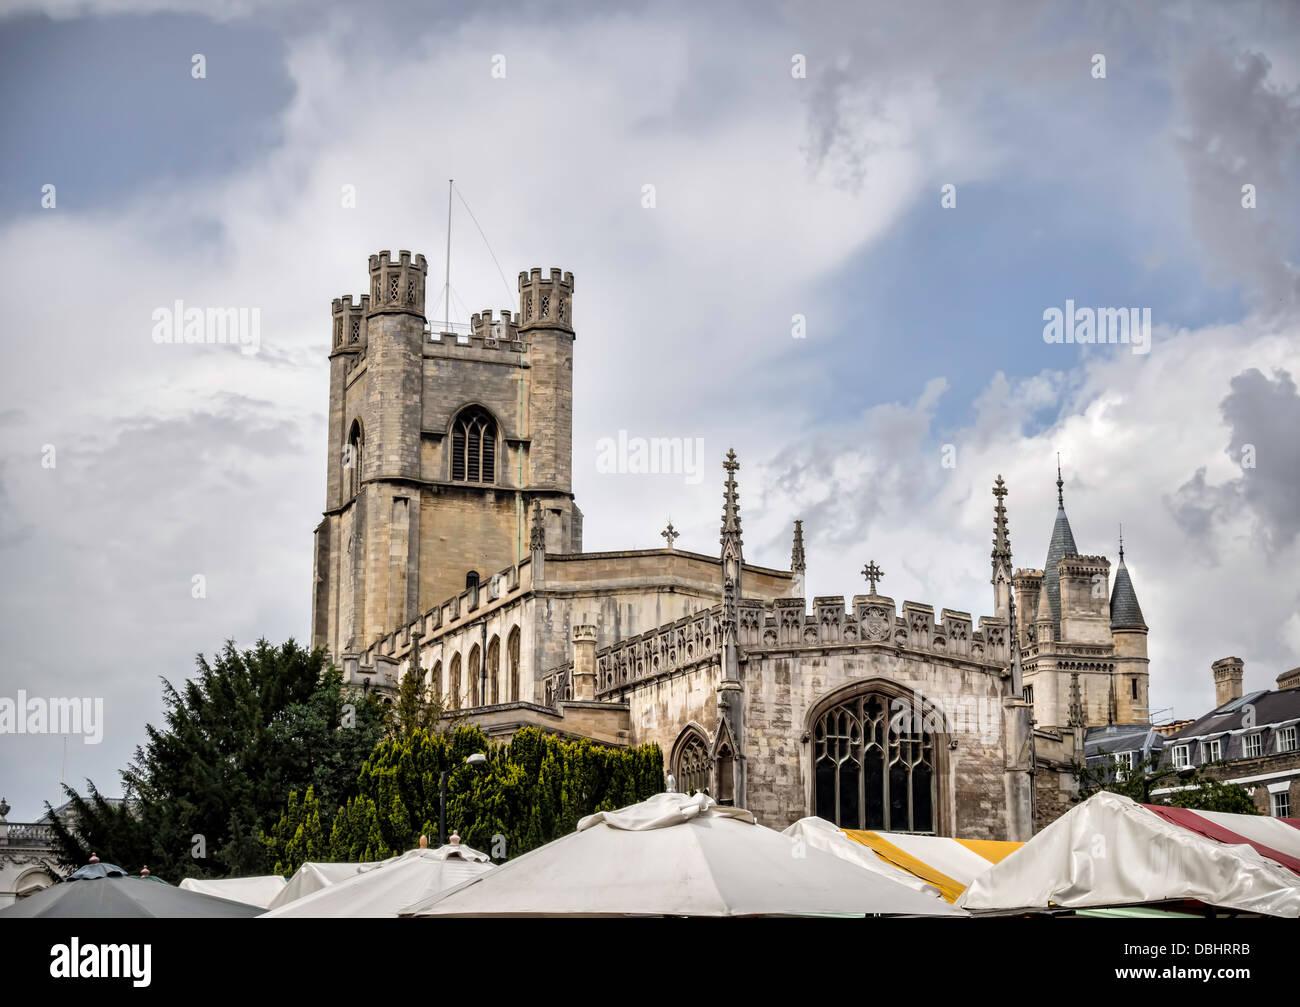 Great St Marys The University Church, Cambridge - Stock Image